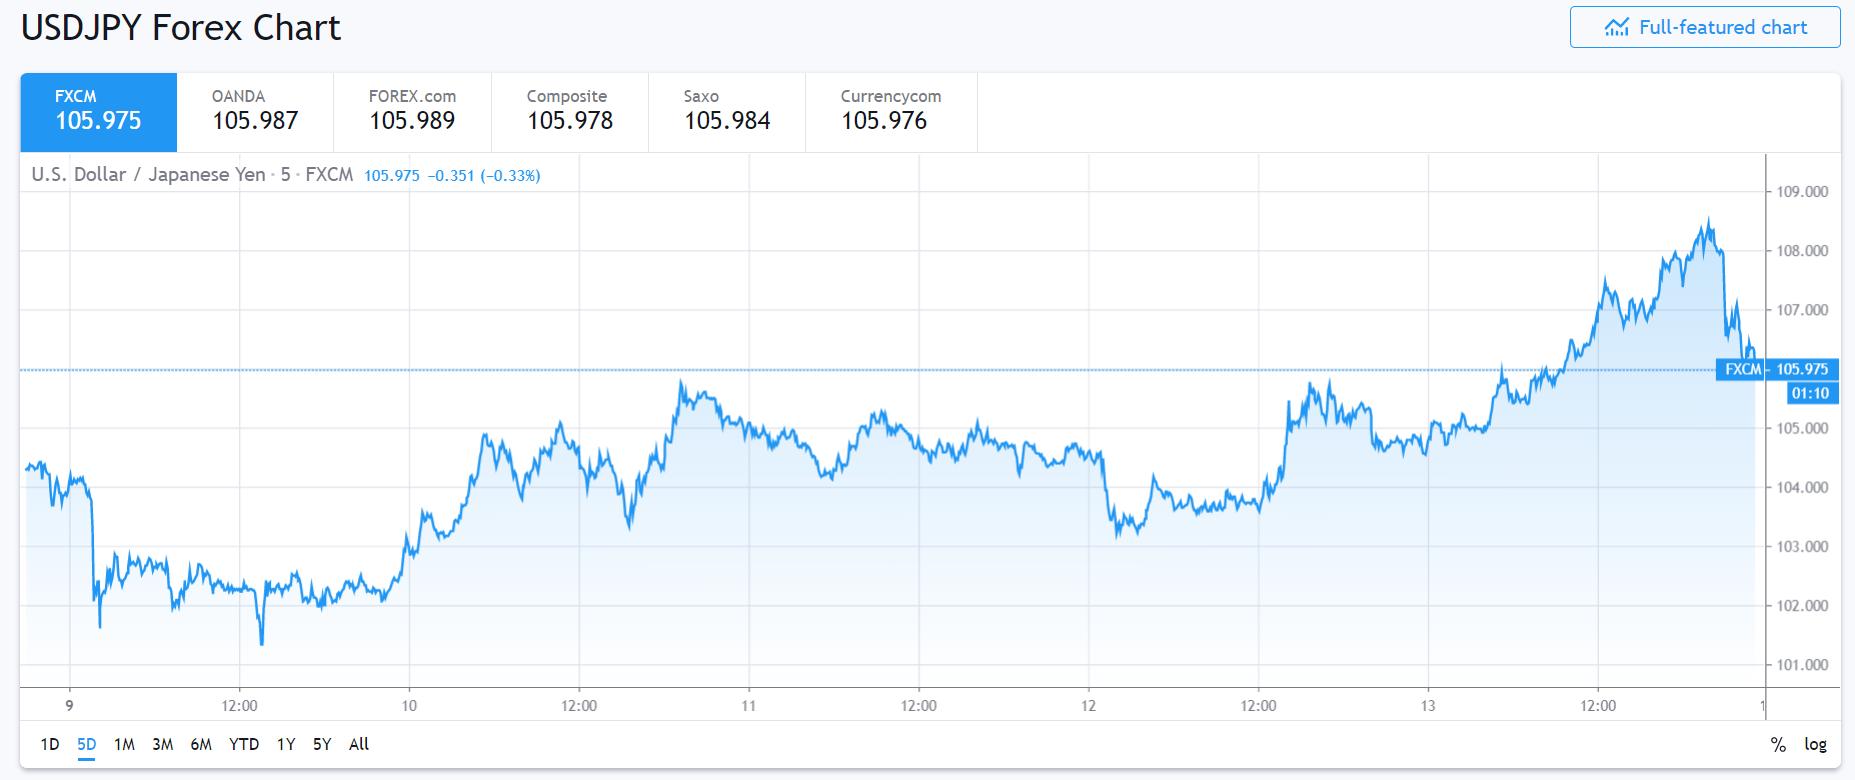 USD JPY FXCM 5D Chart - 16 March 2020